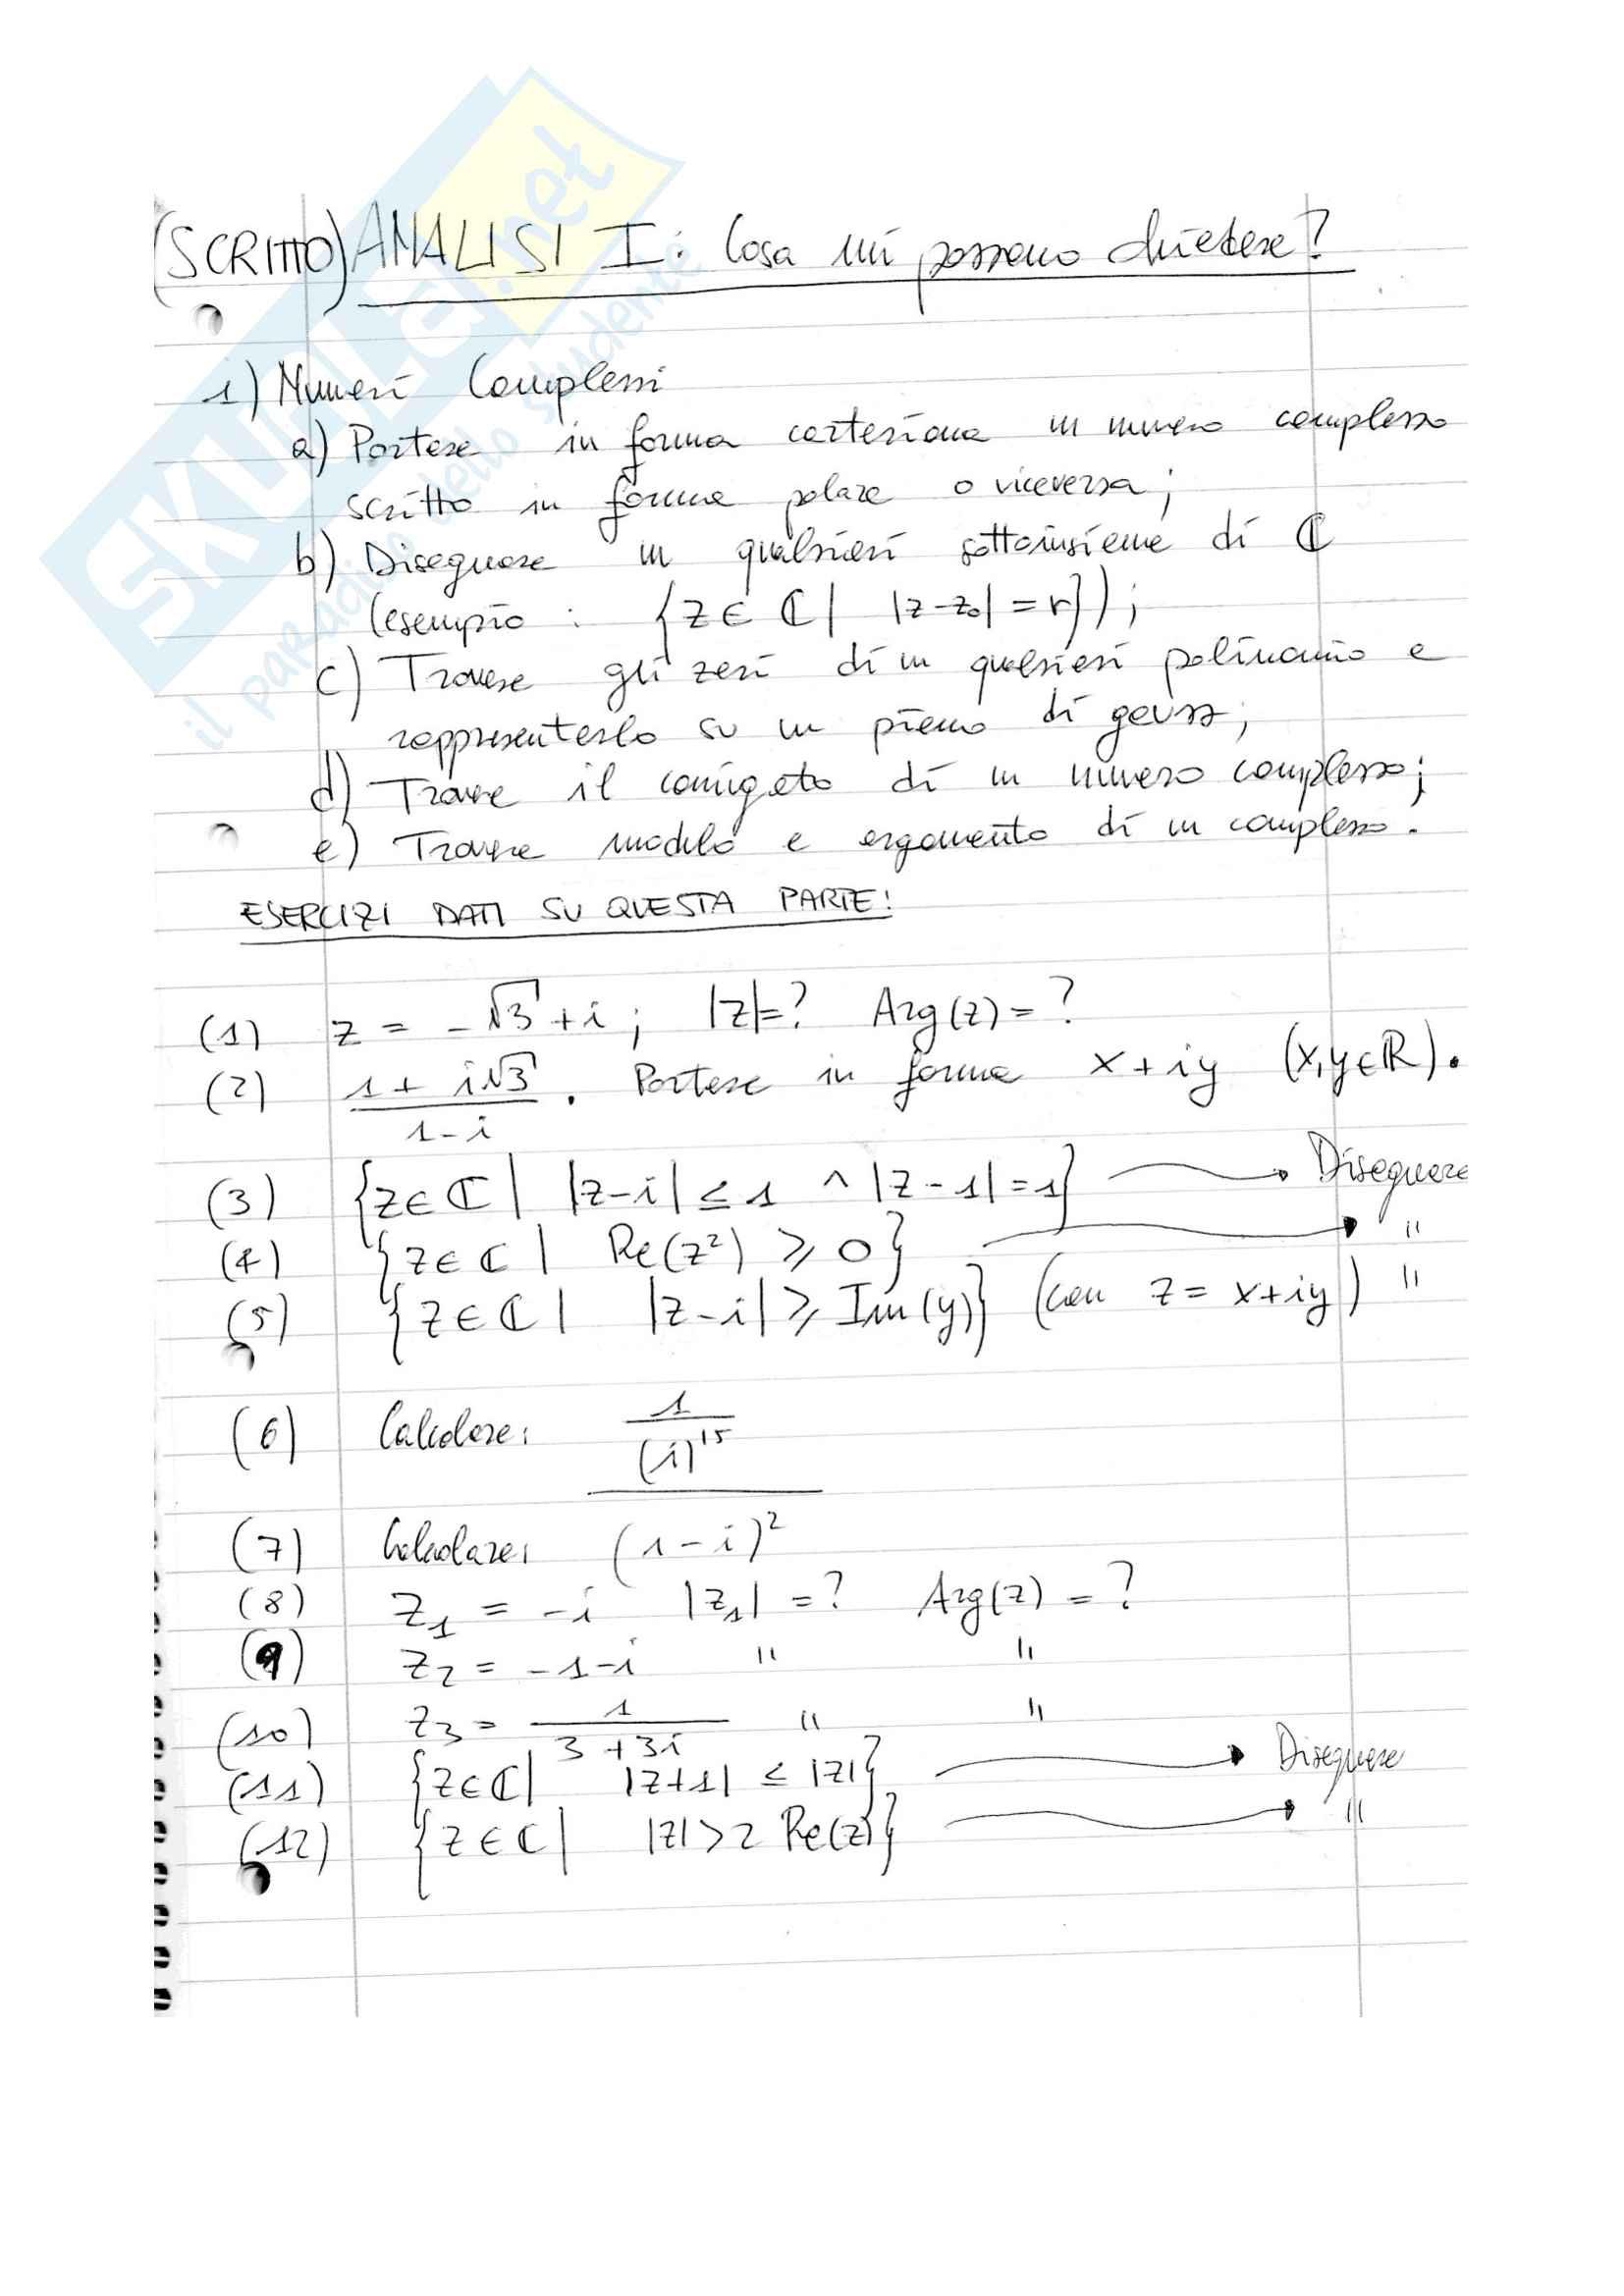 Riassunti analisi 1 e formule notevoli